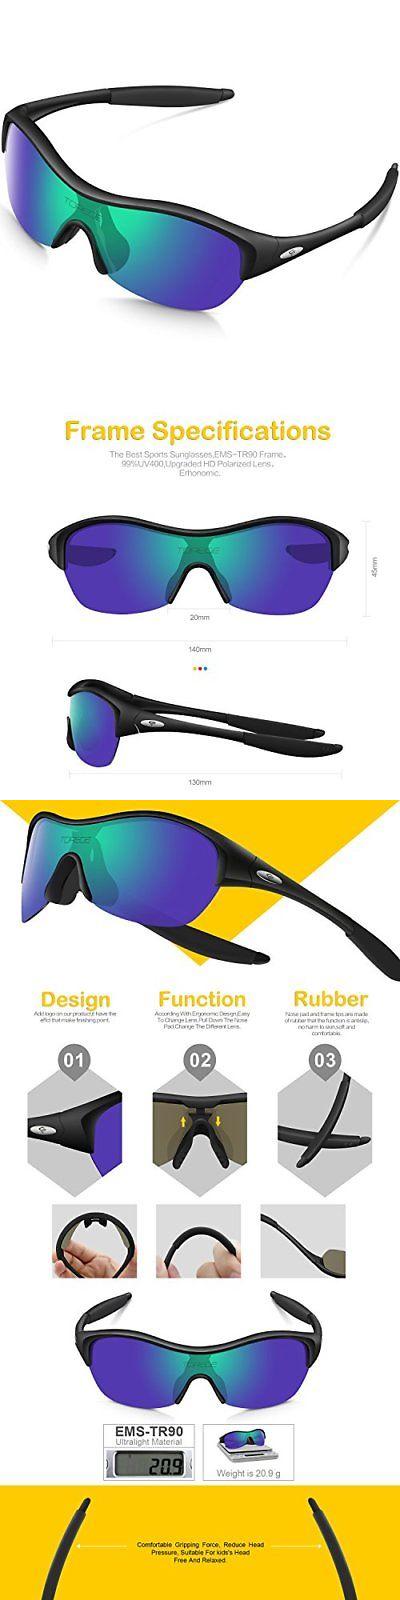 9a151b9098 Sunglasses 122340  Torege Tr90 Flexible Kids Sports Sunglasses Polarized  Glasses For Junior Boys -